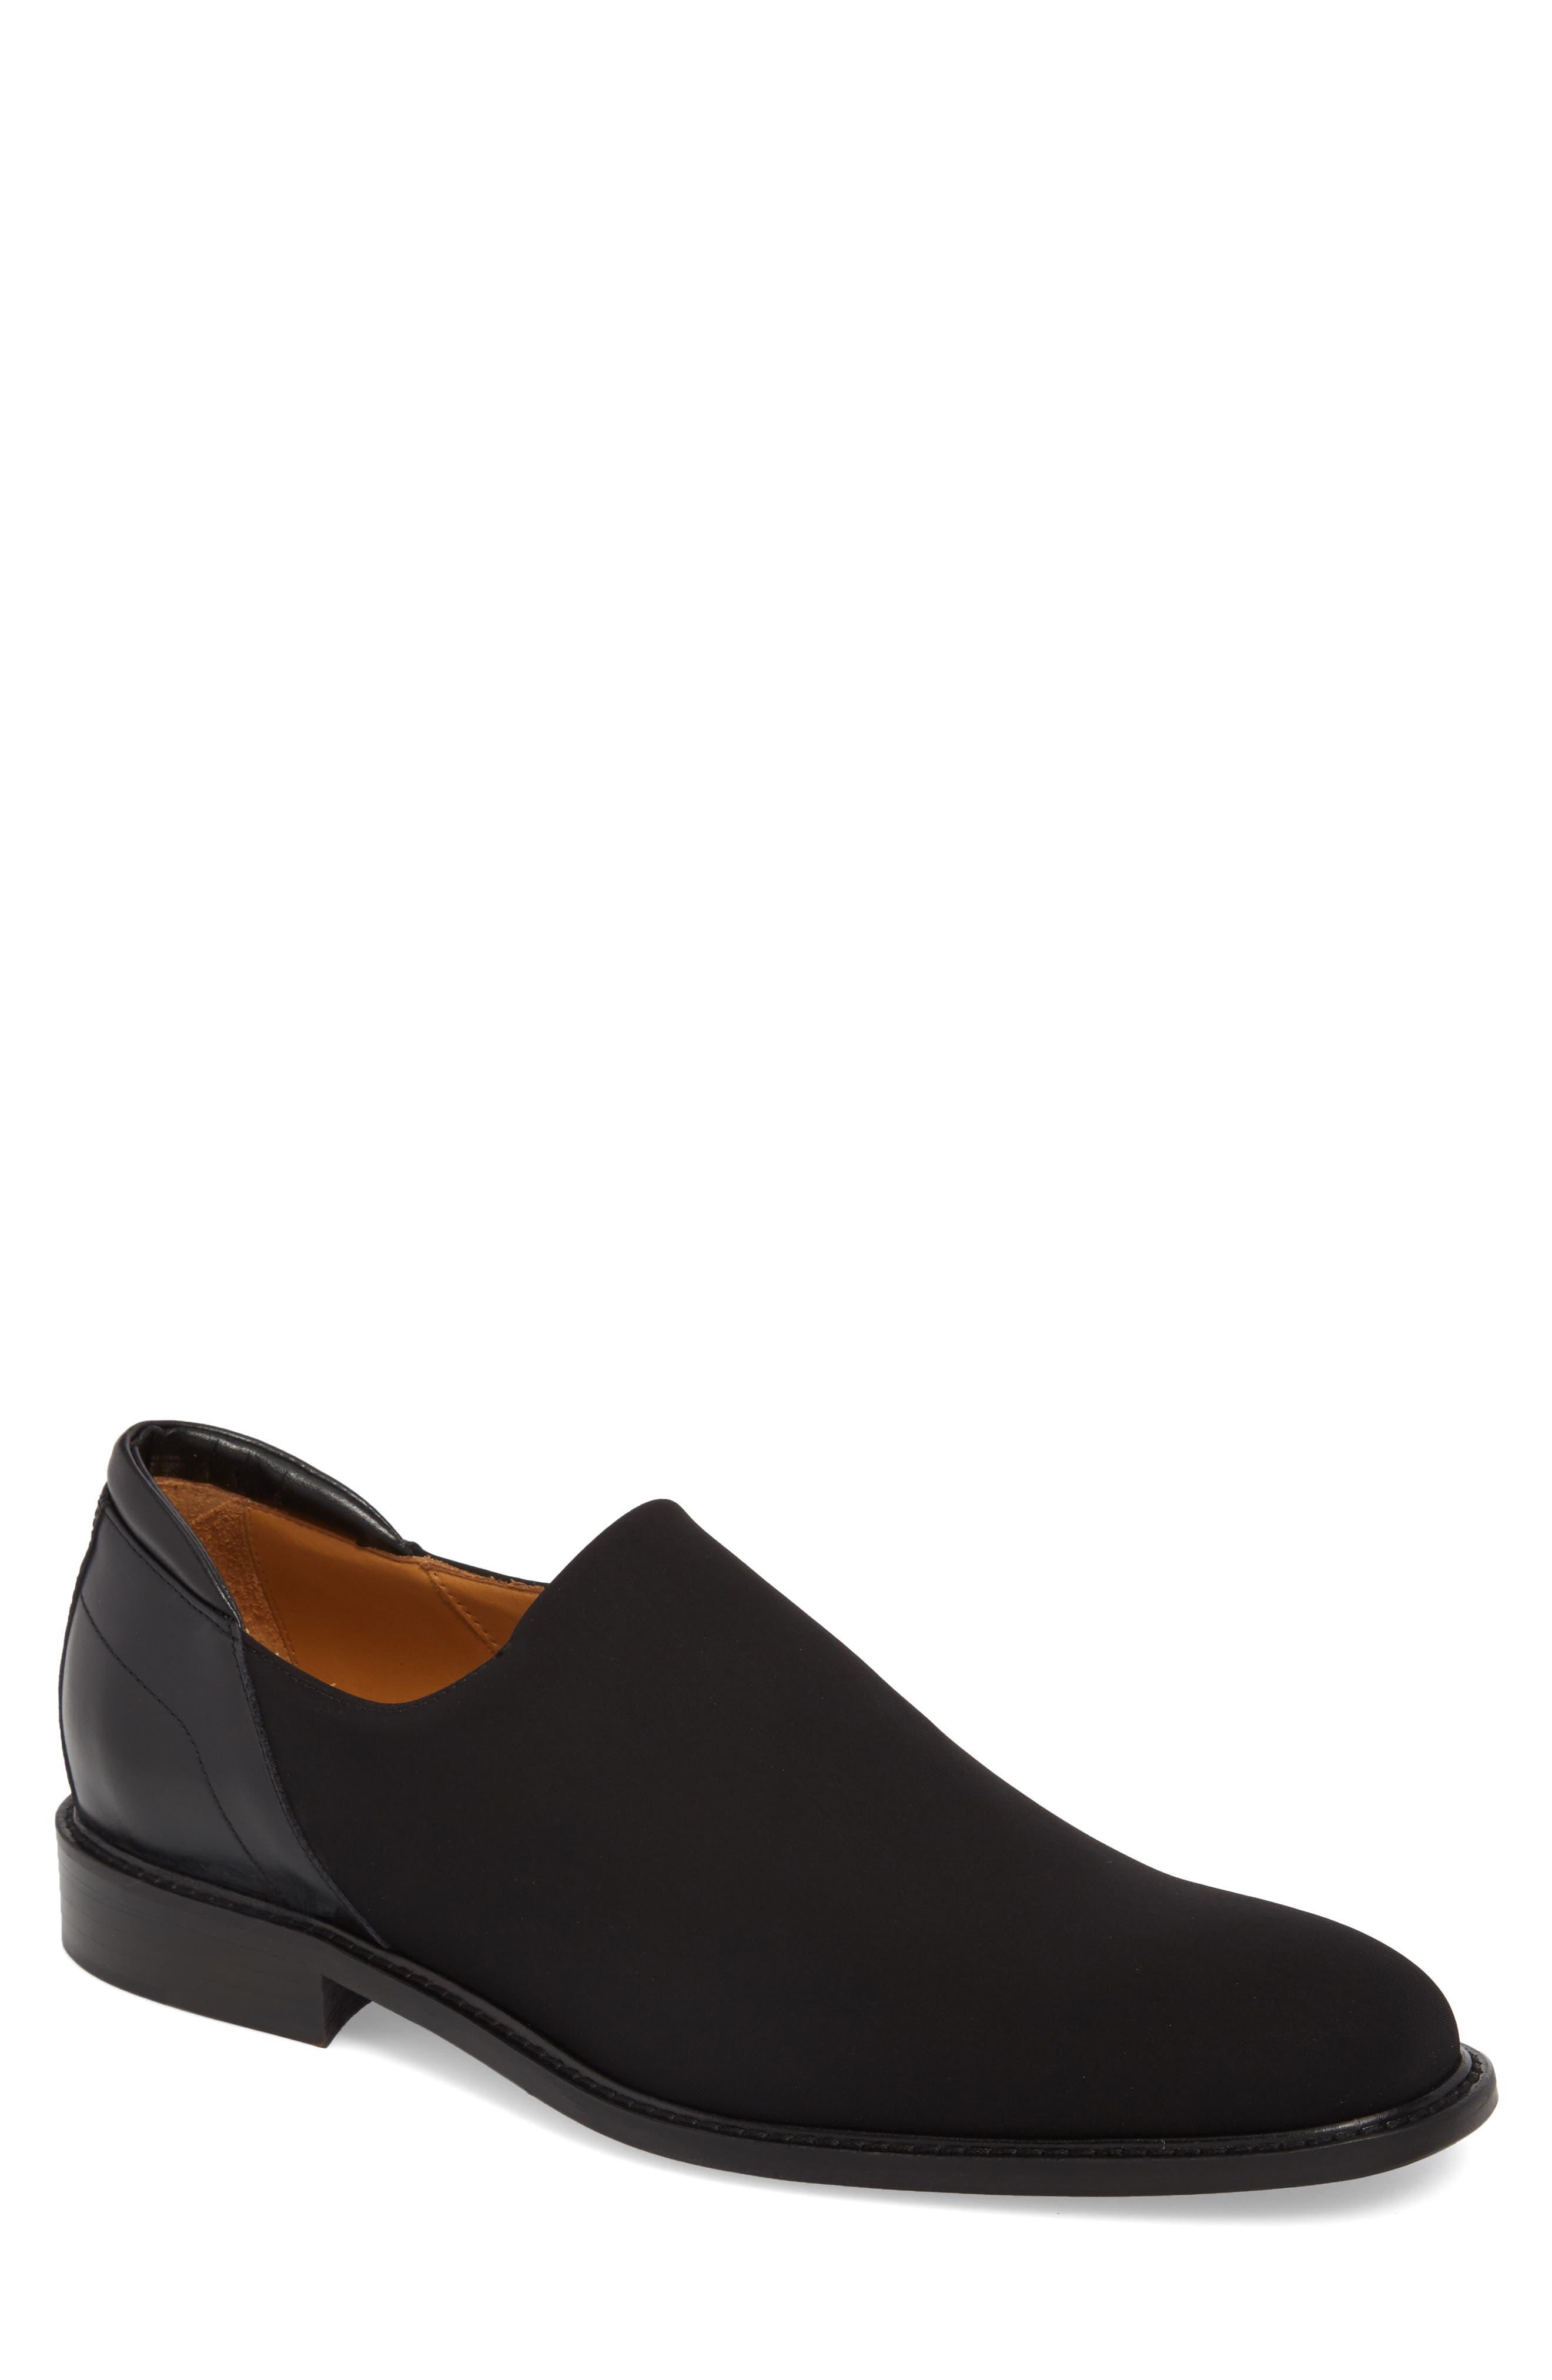 Iggy Slip-On,                         Main,                         color, Black Fabric